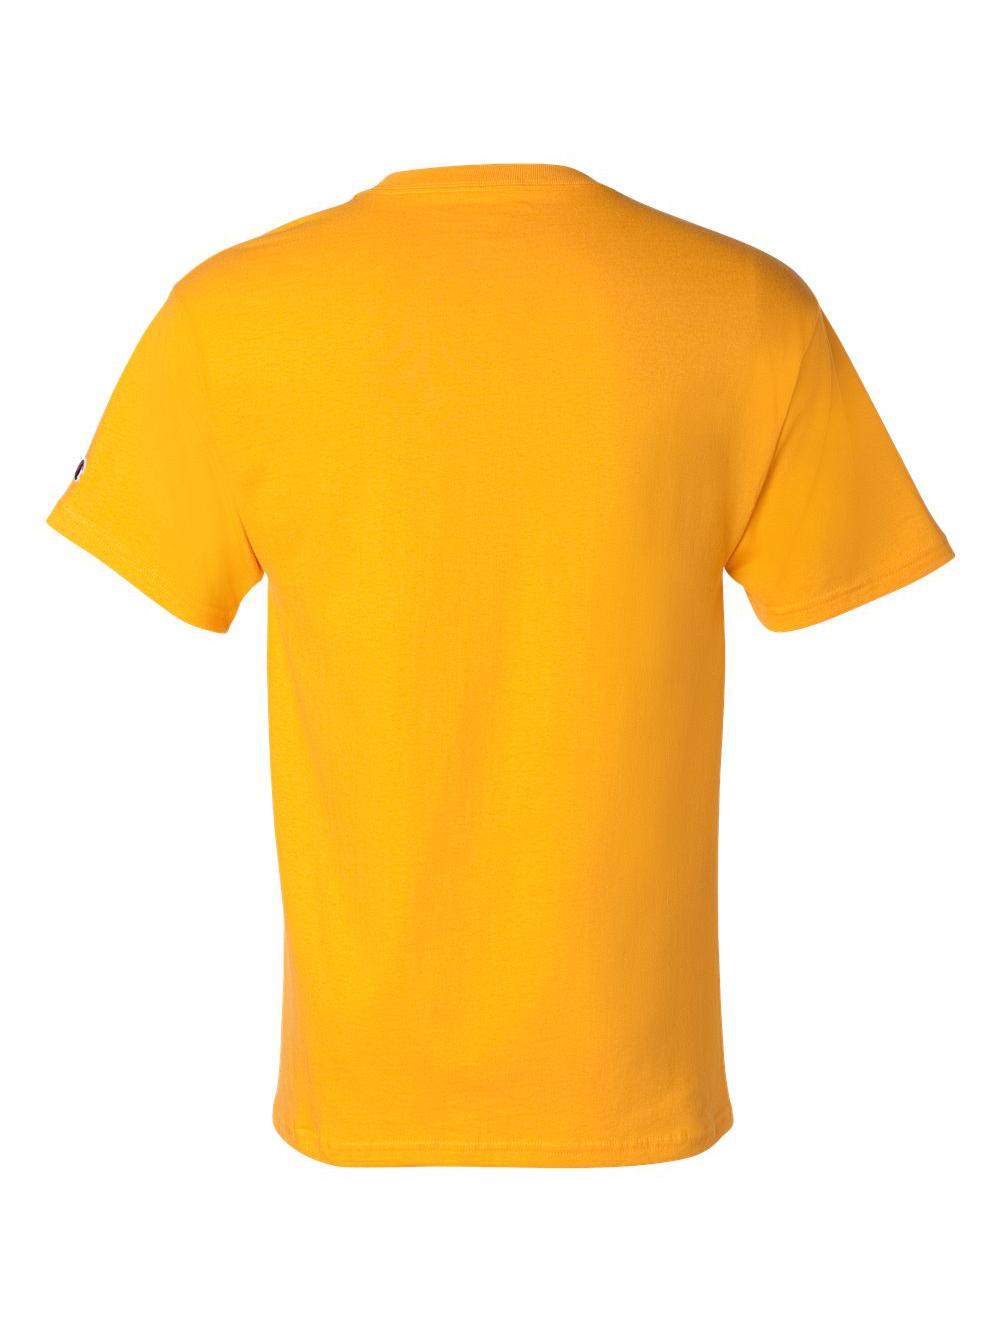 Champion-Short-Sleeve-T-Shirt-T425 thumbnail 16